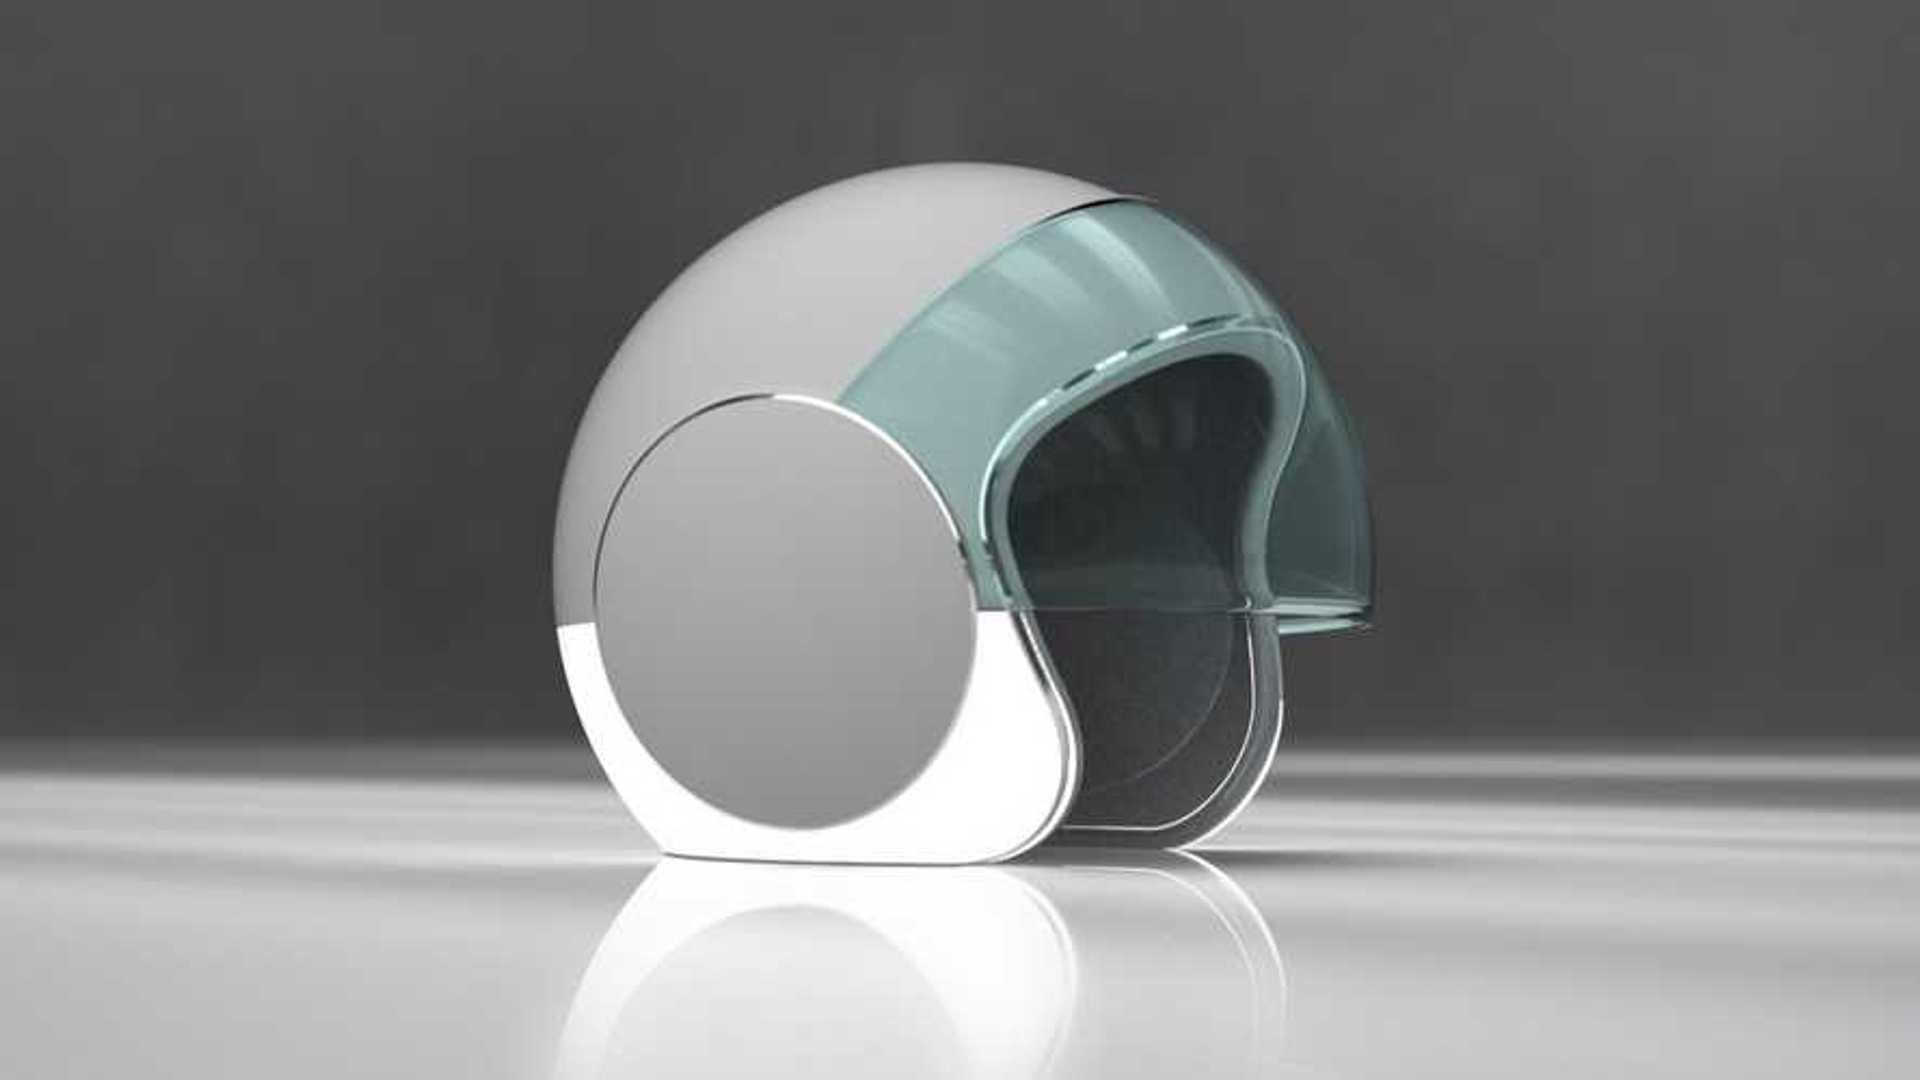 New Motorcycle Helmet Design Illuminates Its Shell